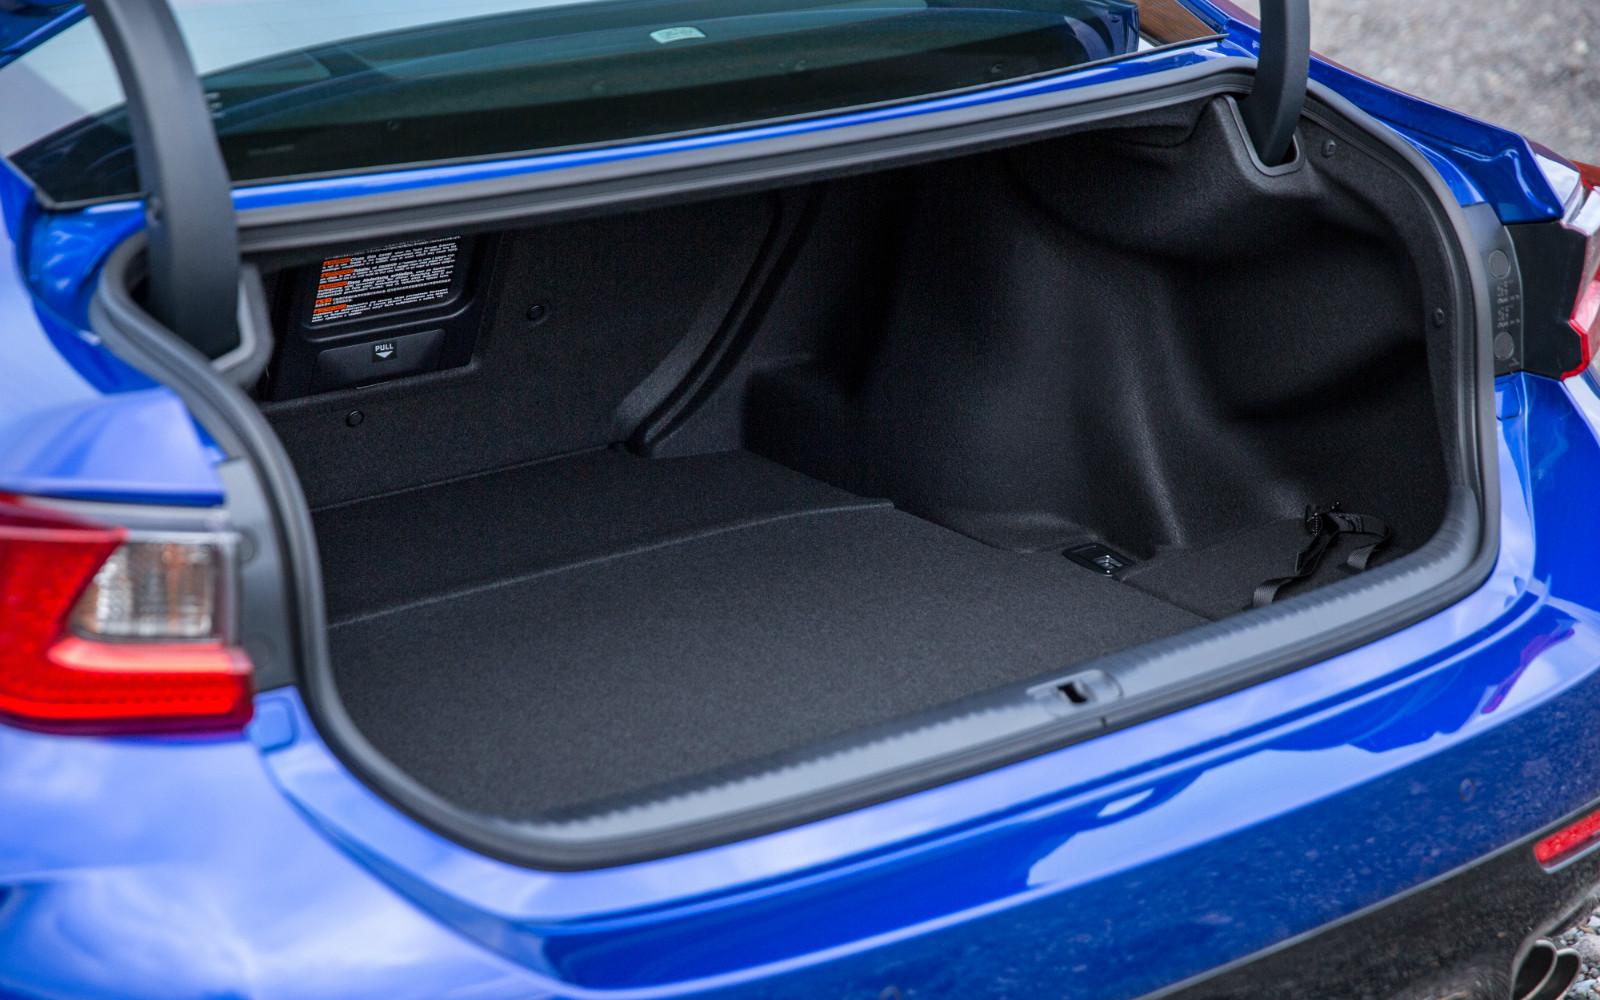 Lexus RC F 2015 Boot Detail